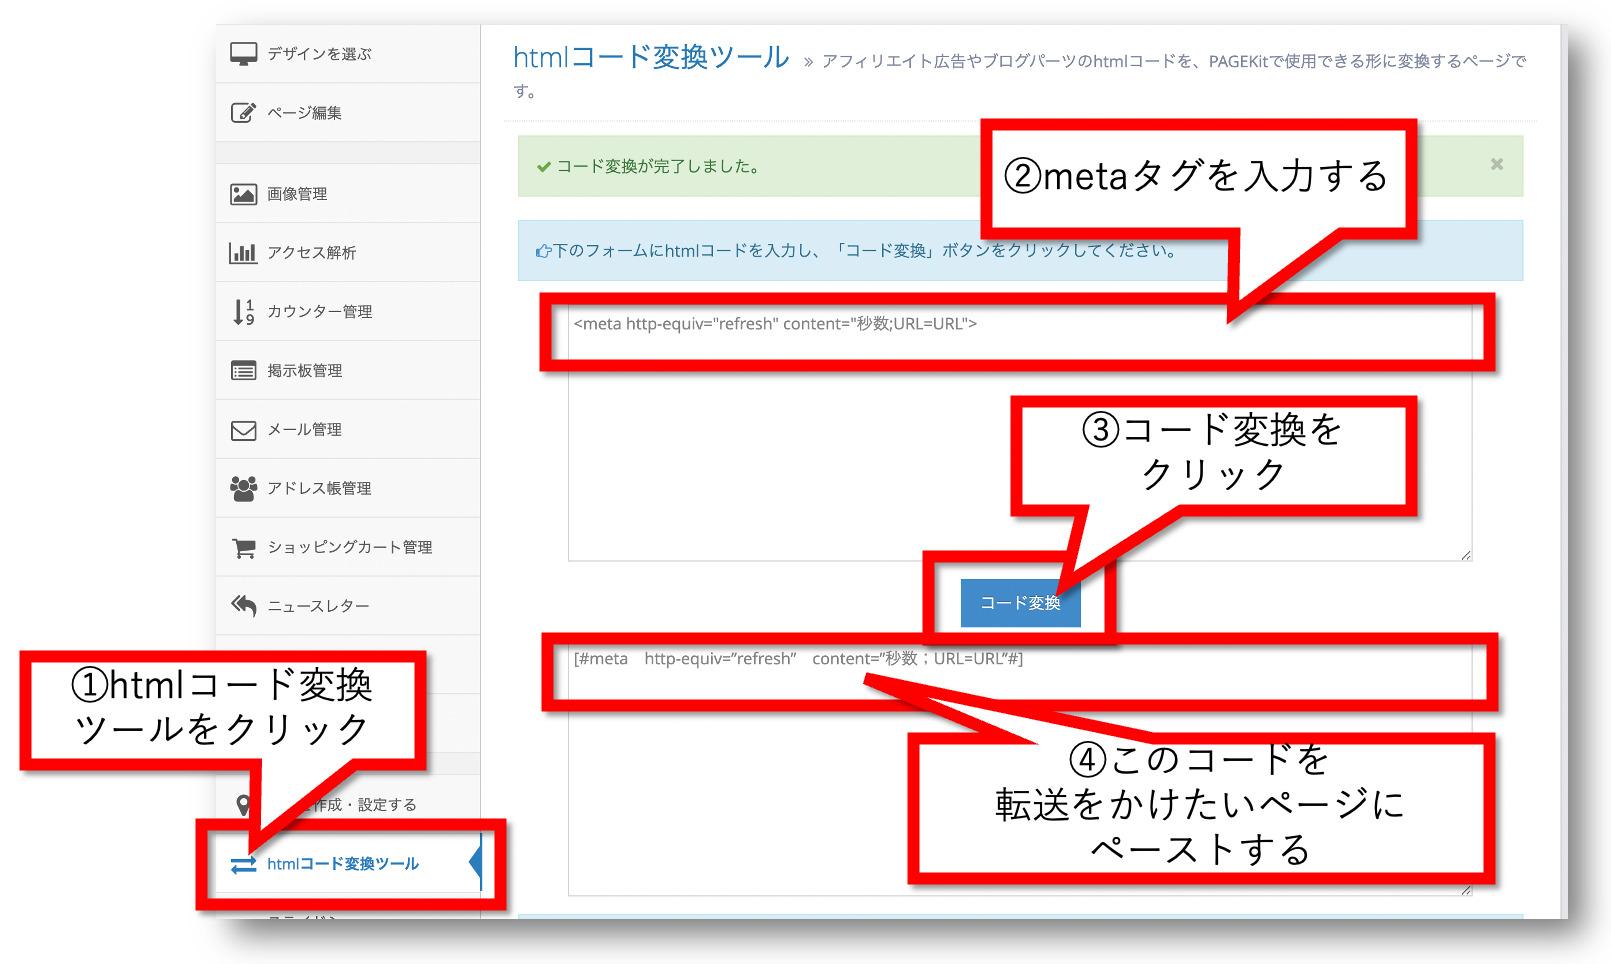 Pagekitでhtmlコード変換